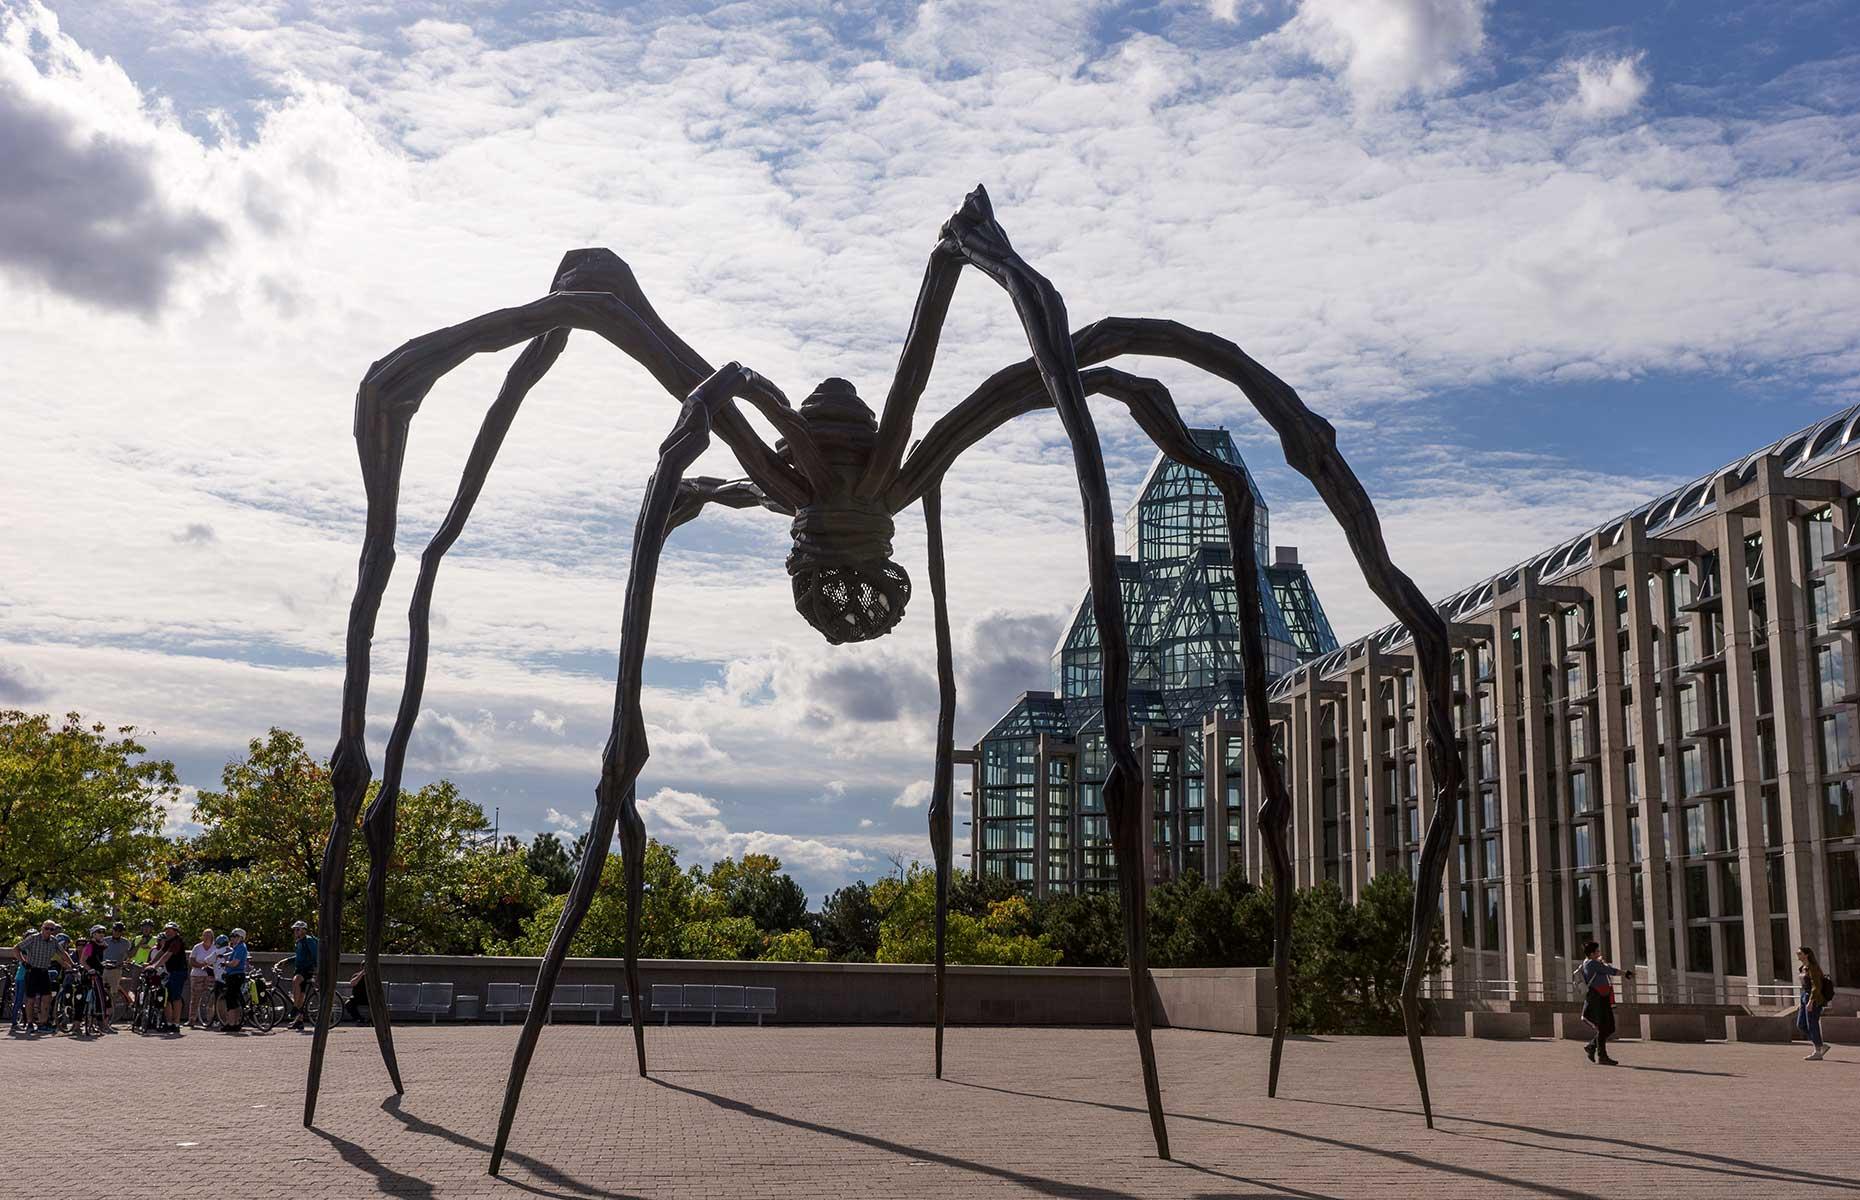 National Gallery of Canada, Ottawa-Ontario (Image: kelifamily/Shutterstock)